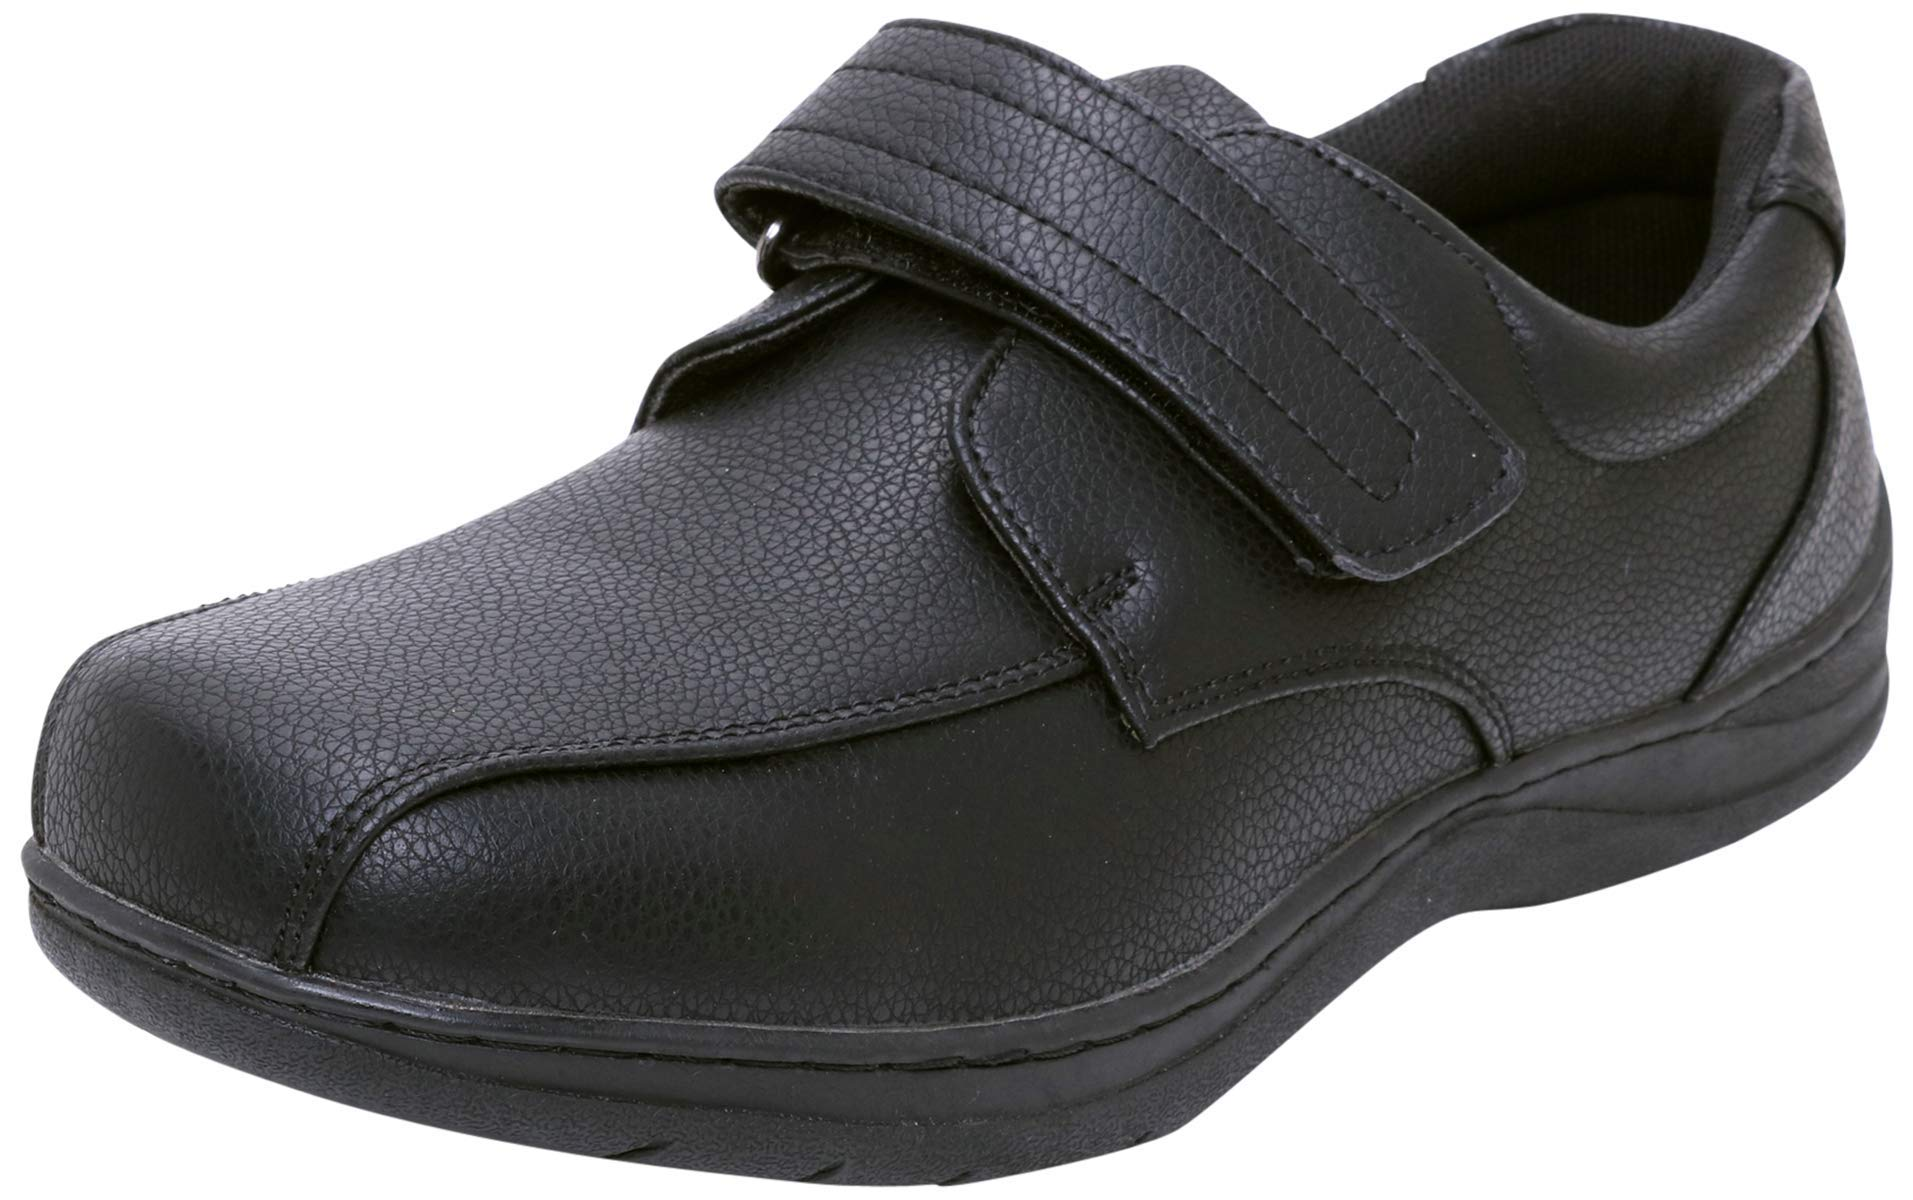 Easy Strider Boys' Everyday Memory Foam School Uniform Shoes (Toddler/Little Kid/Big Kid), Black Strap, Size 11 Little Kid'